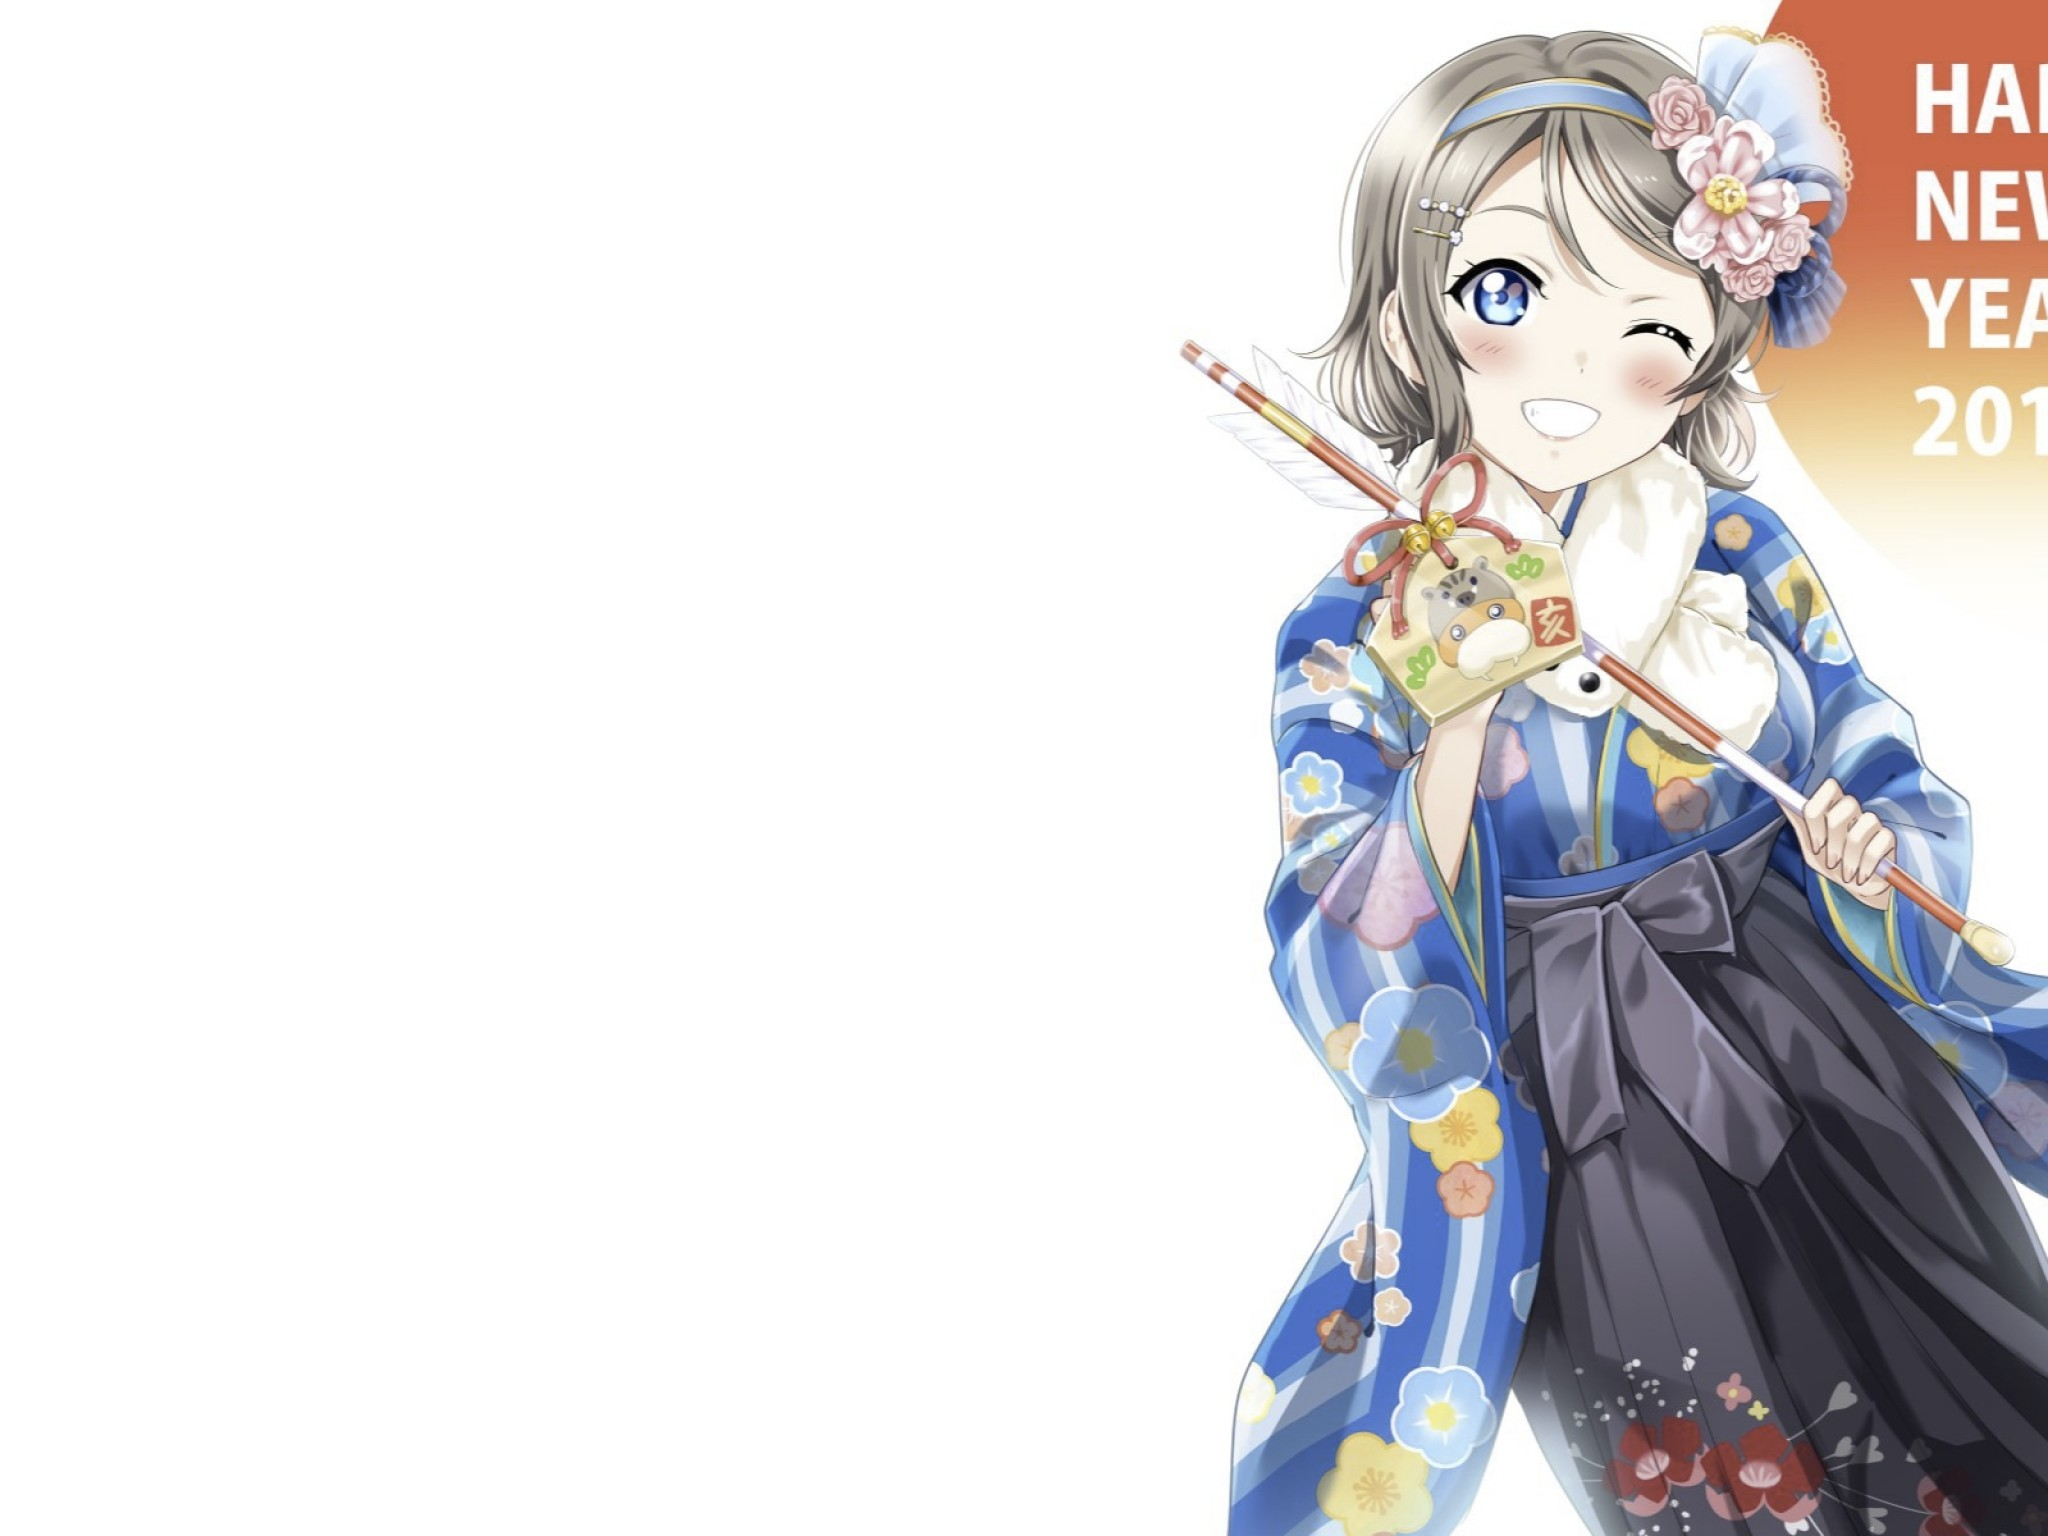 Watanabe You, Love Live Sunshine, Wink, Happy New Year - Anime - HD Wallpaper